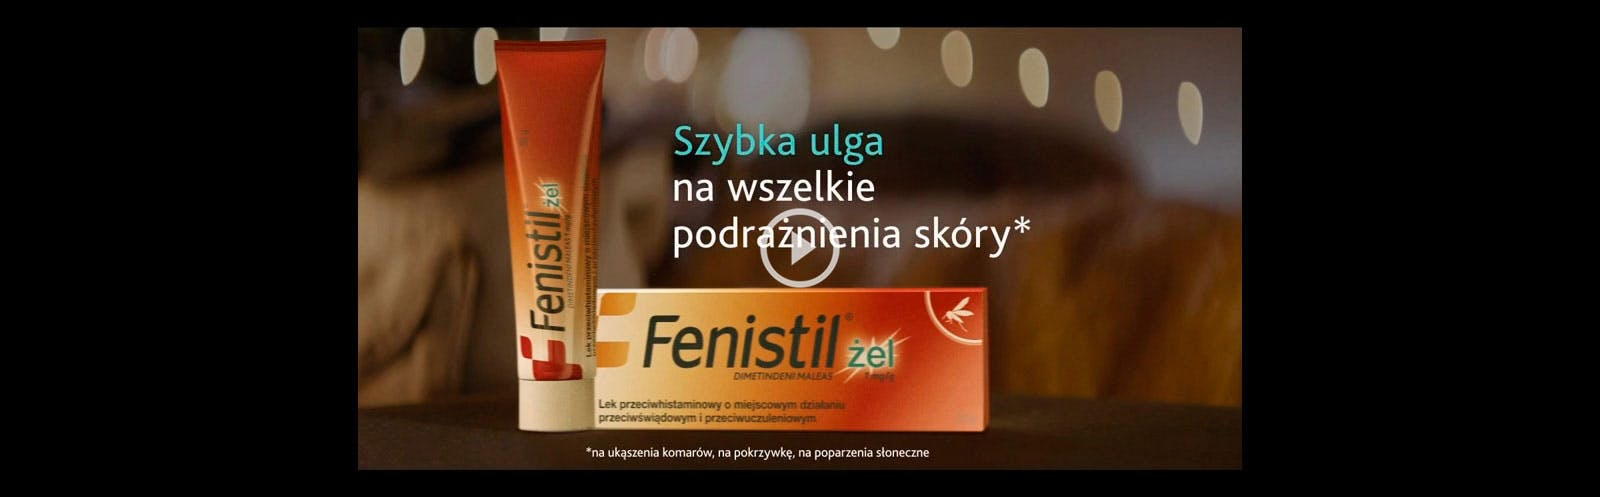 Wideo - Fenistil szybka ulga